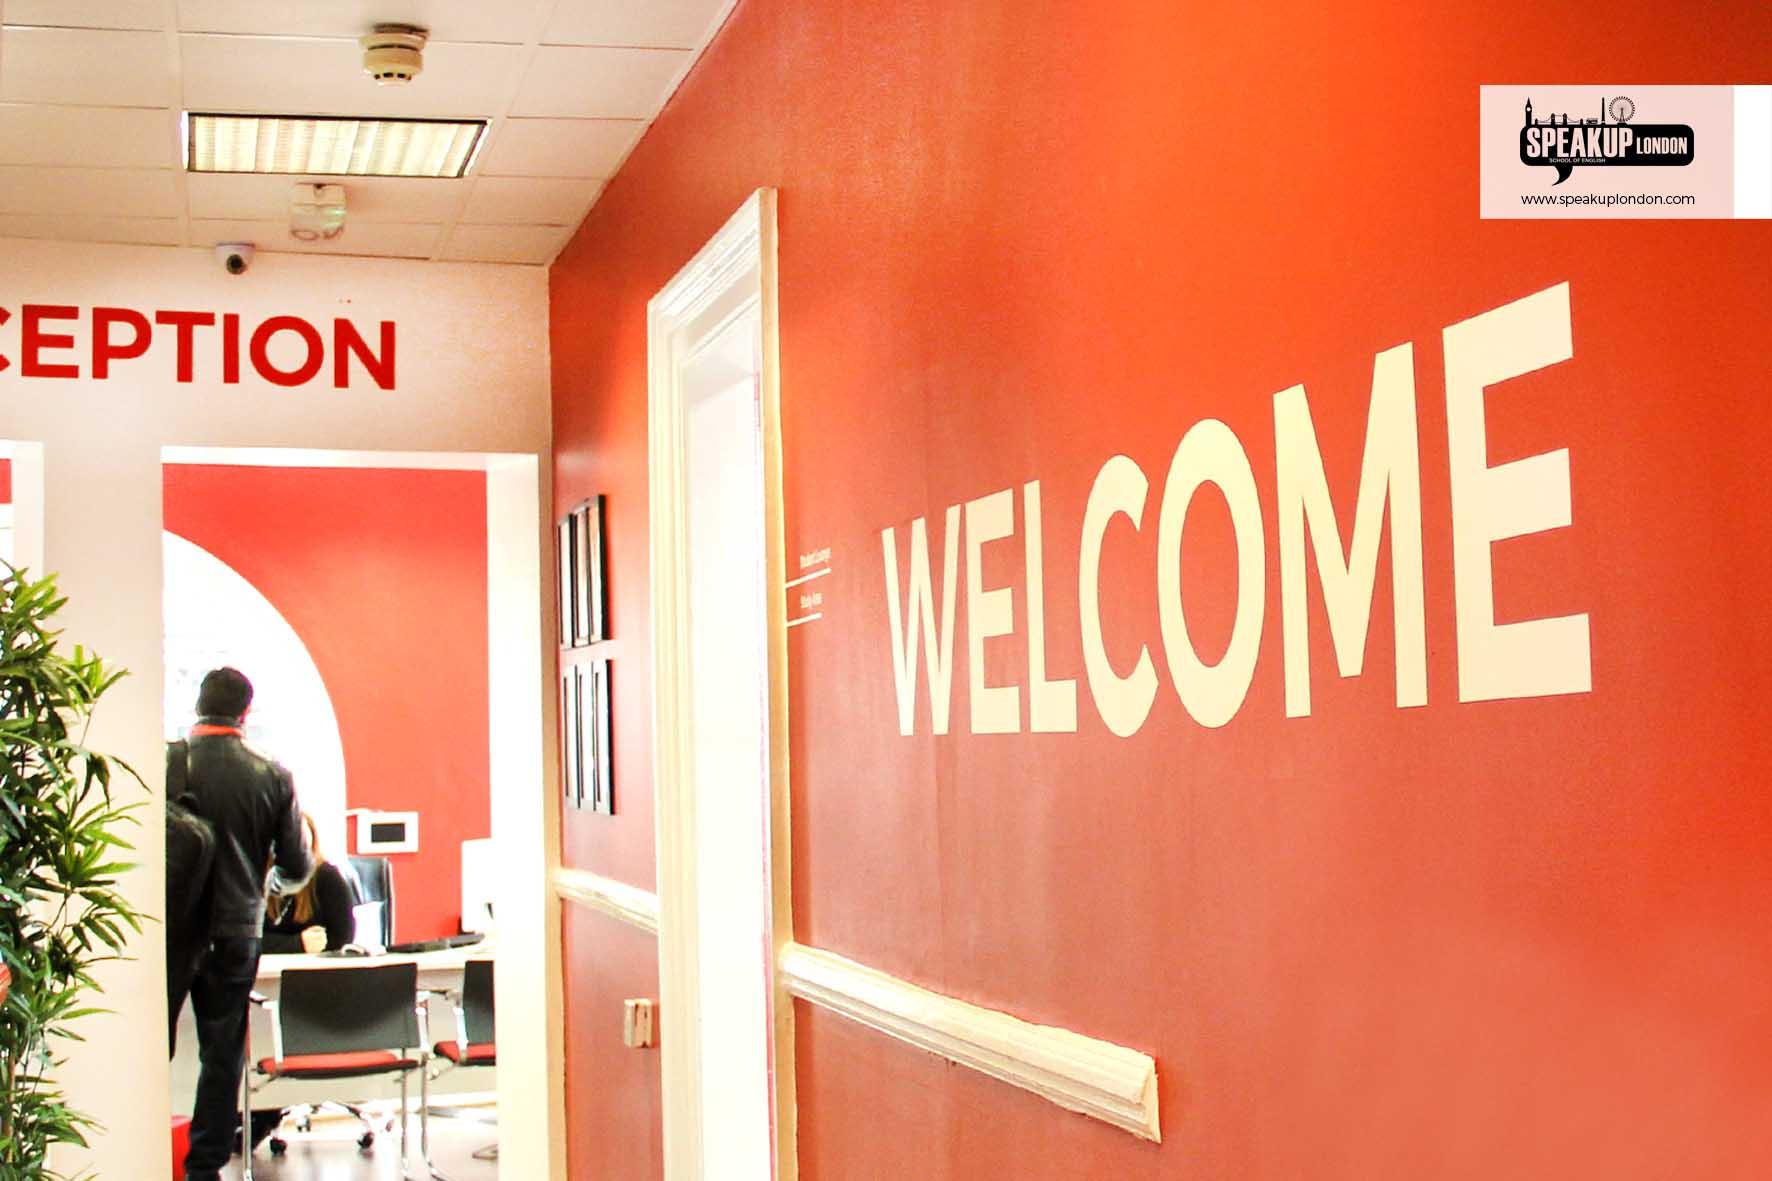 SPEAK UP London London campus